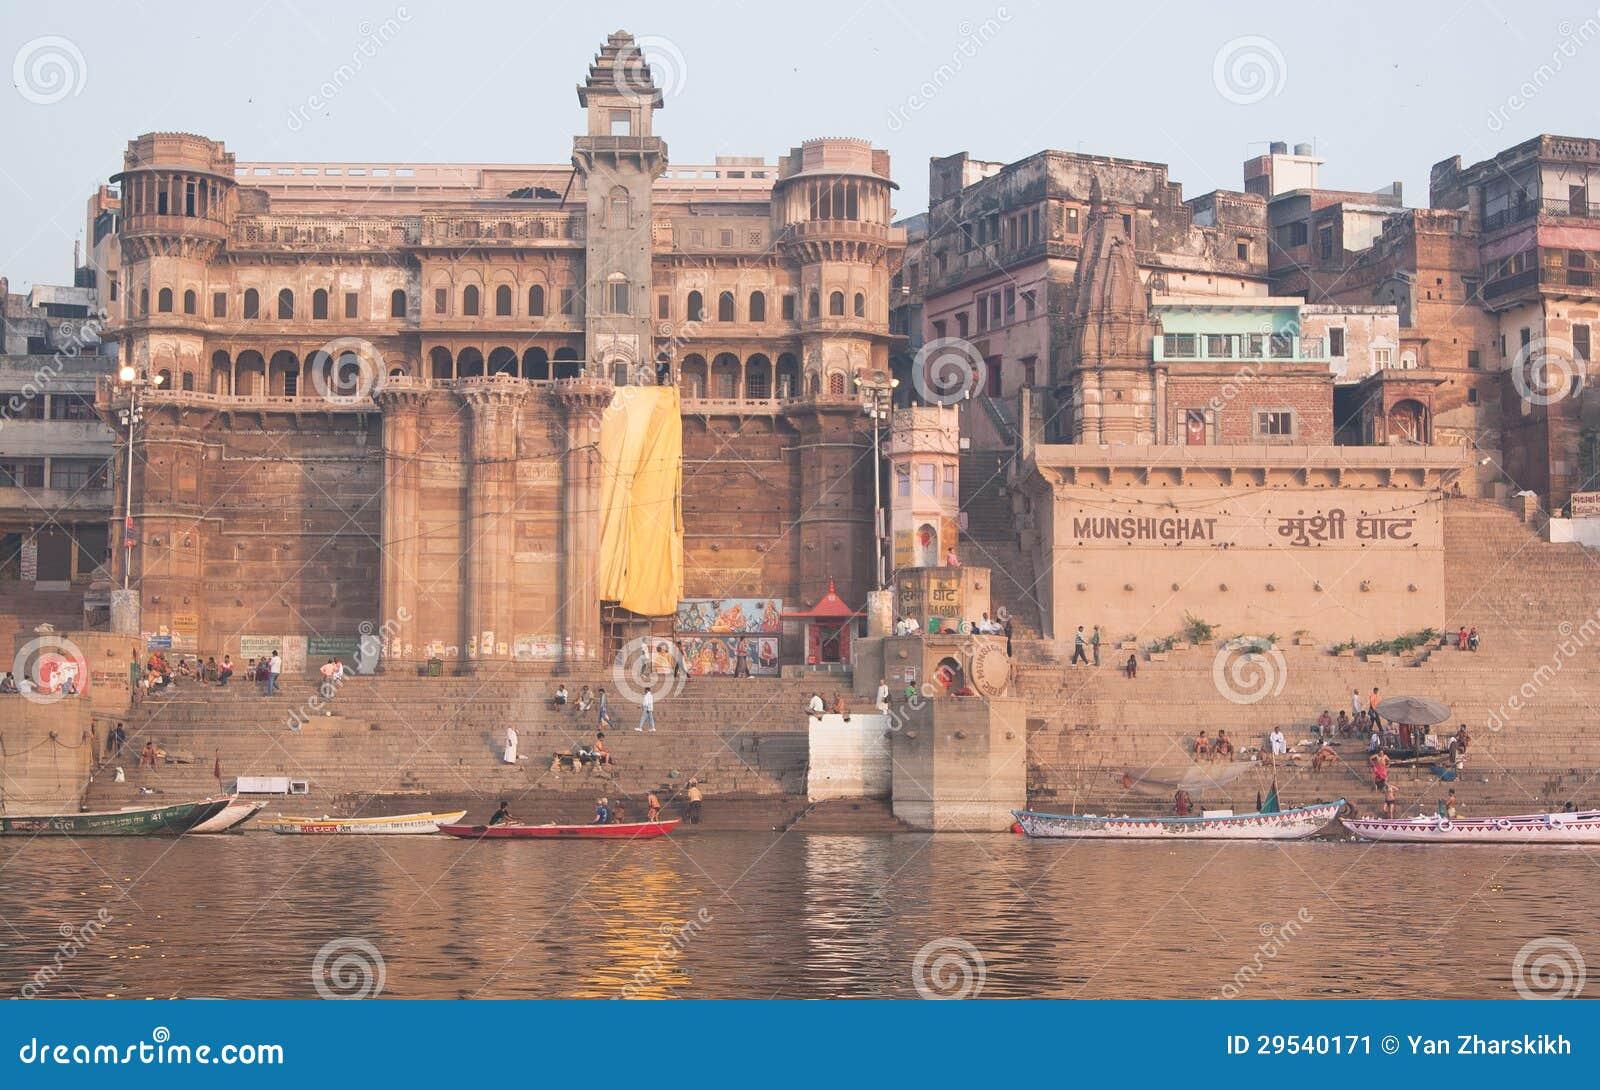 Munshi Ghat